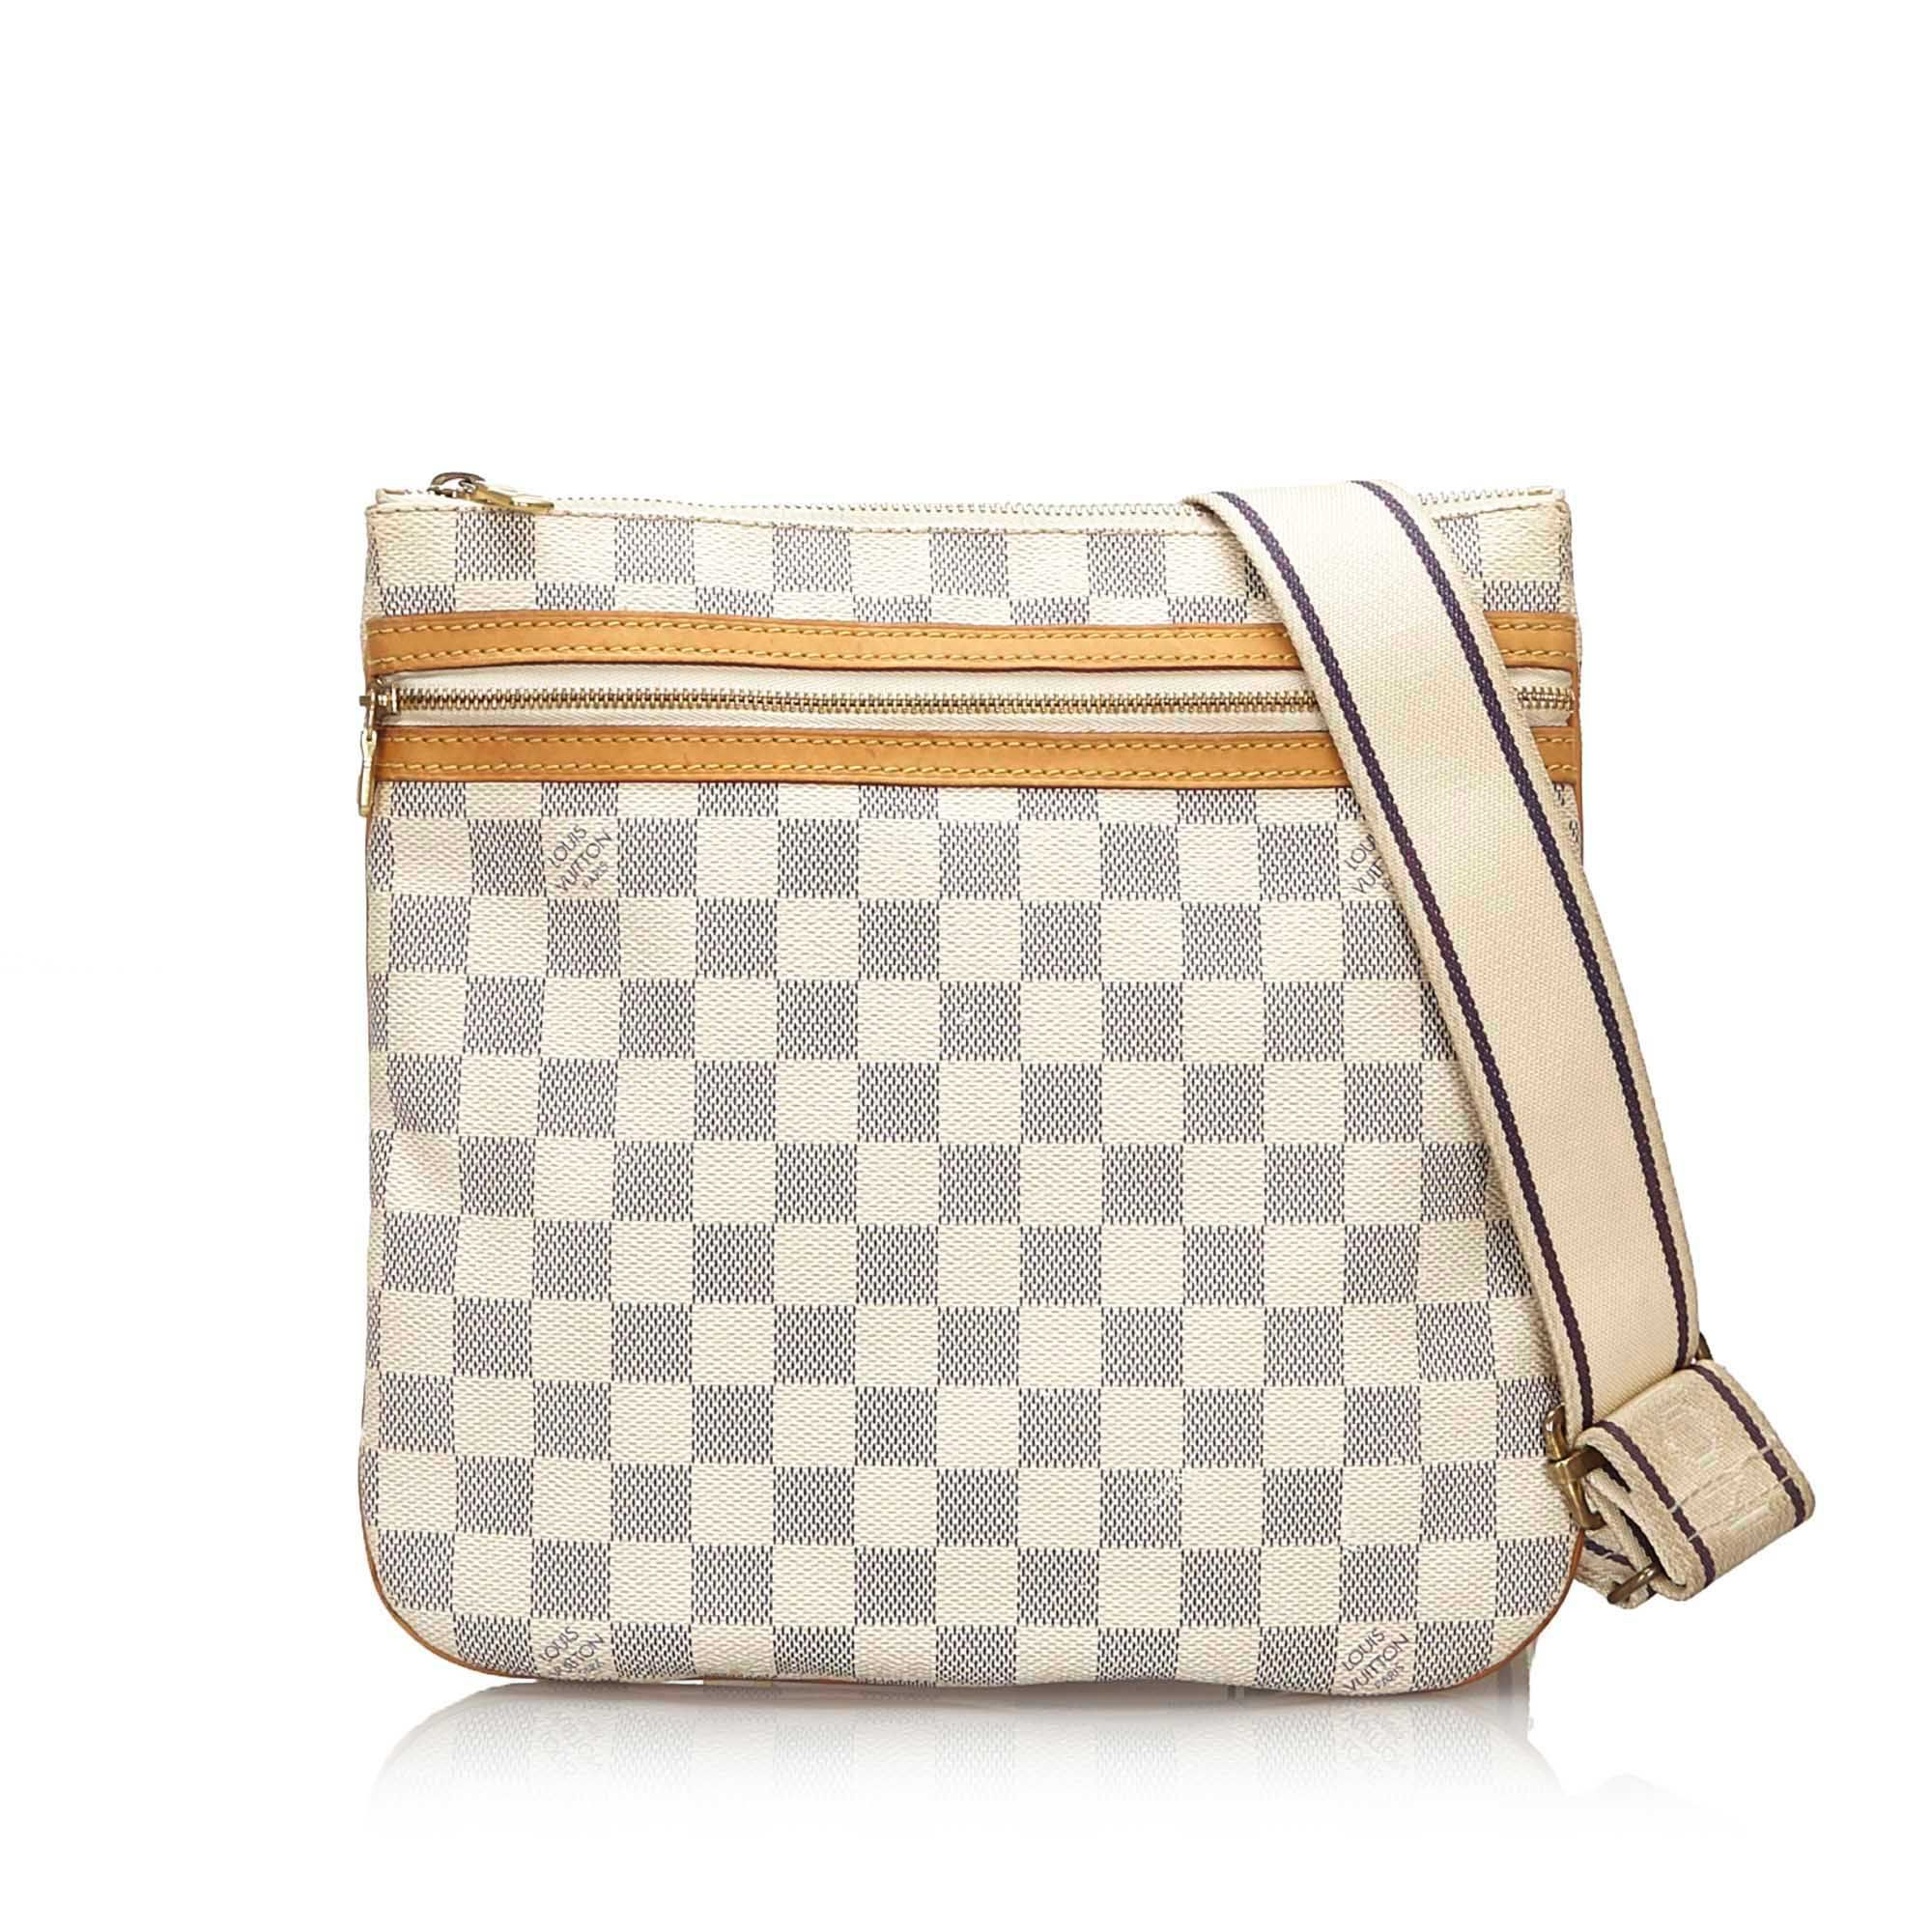 Vintage Louis Vuitton Damier Azur Pochette Bosphore White